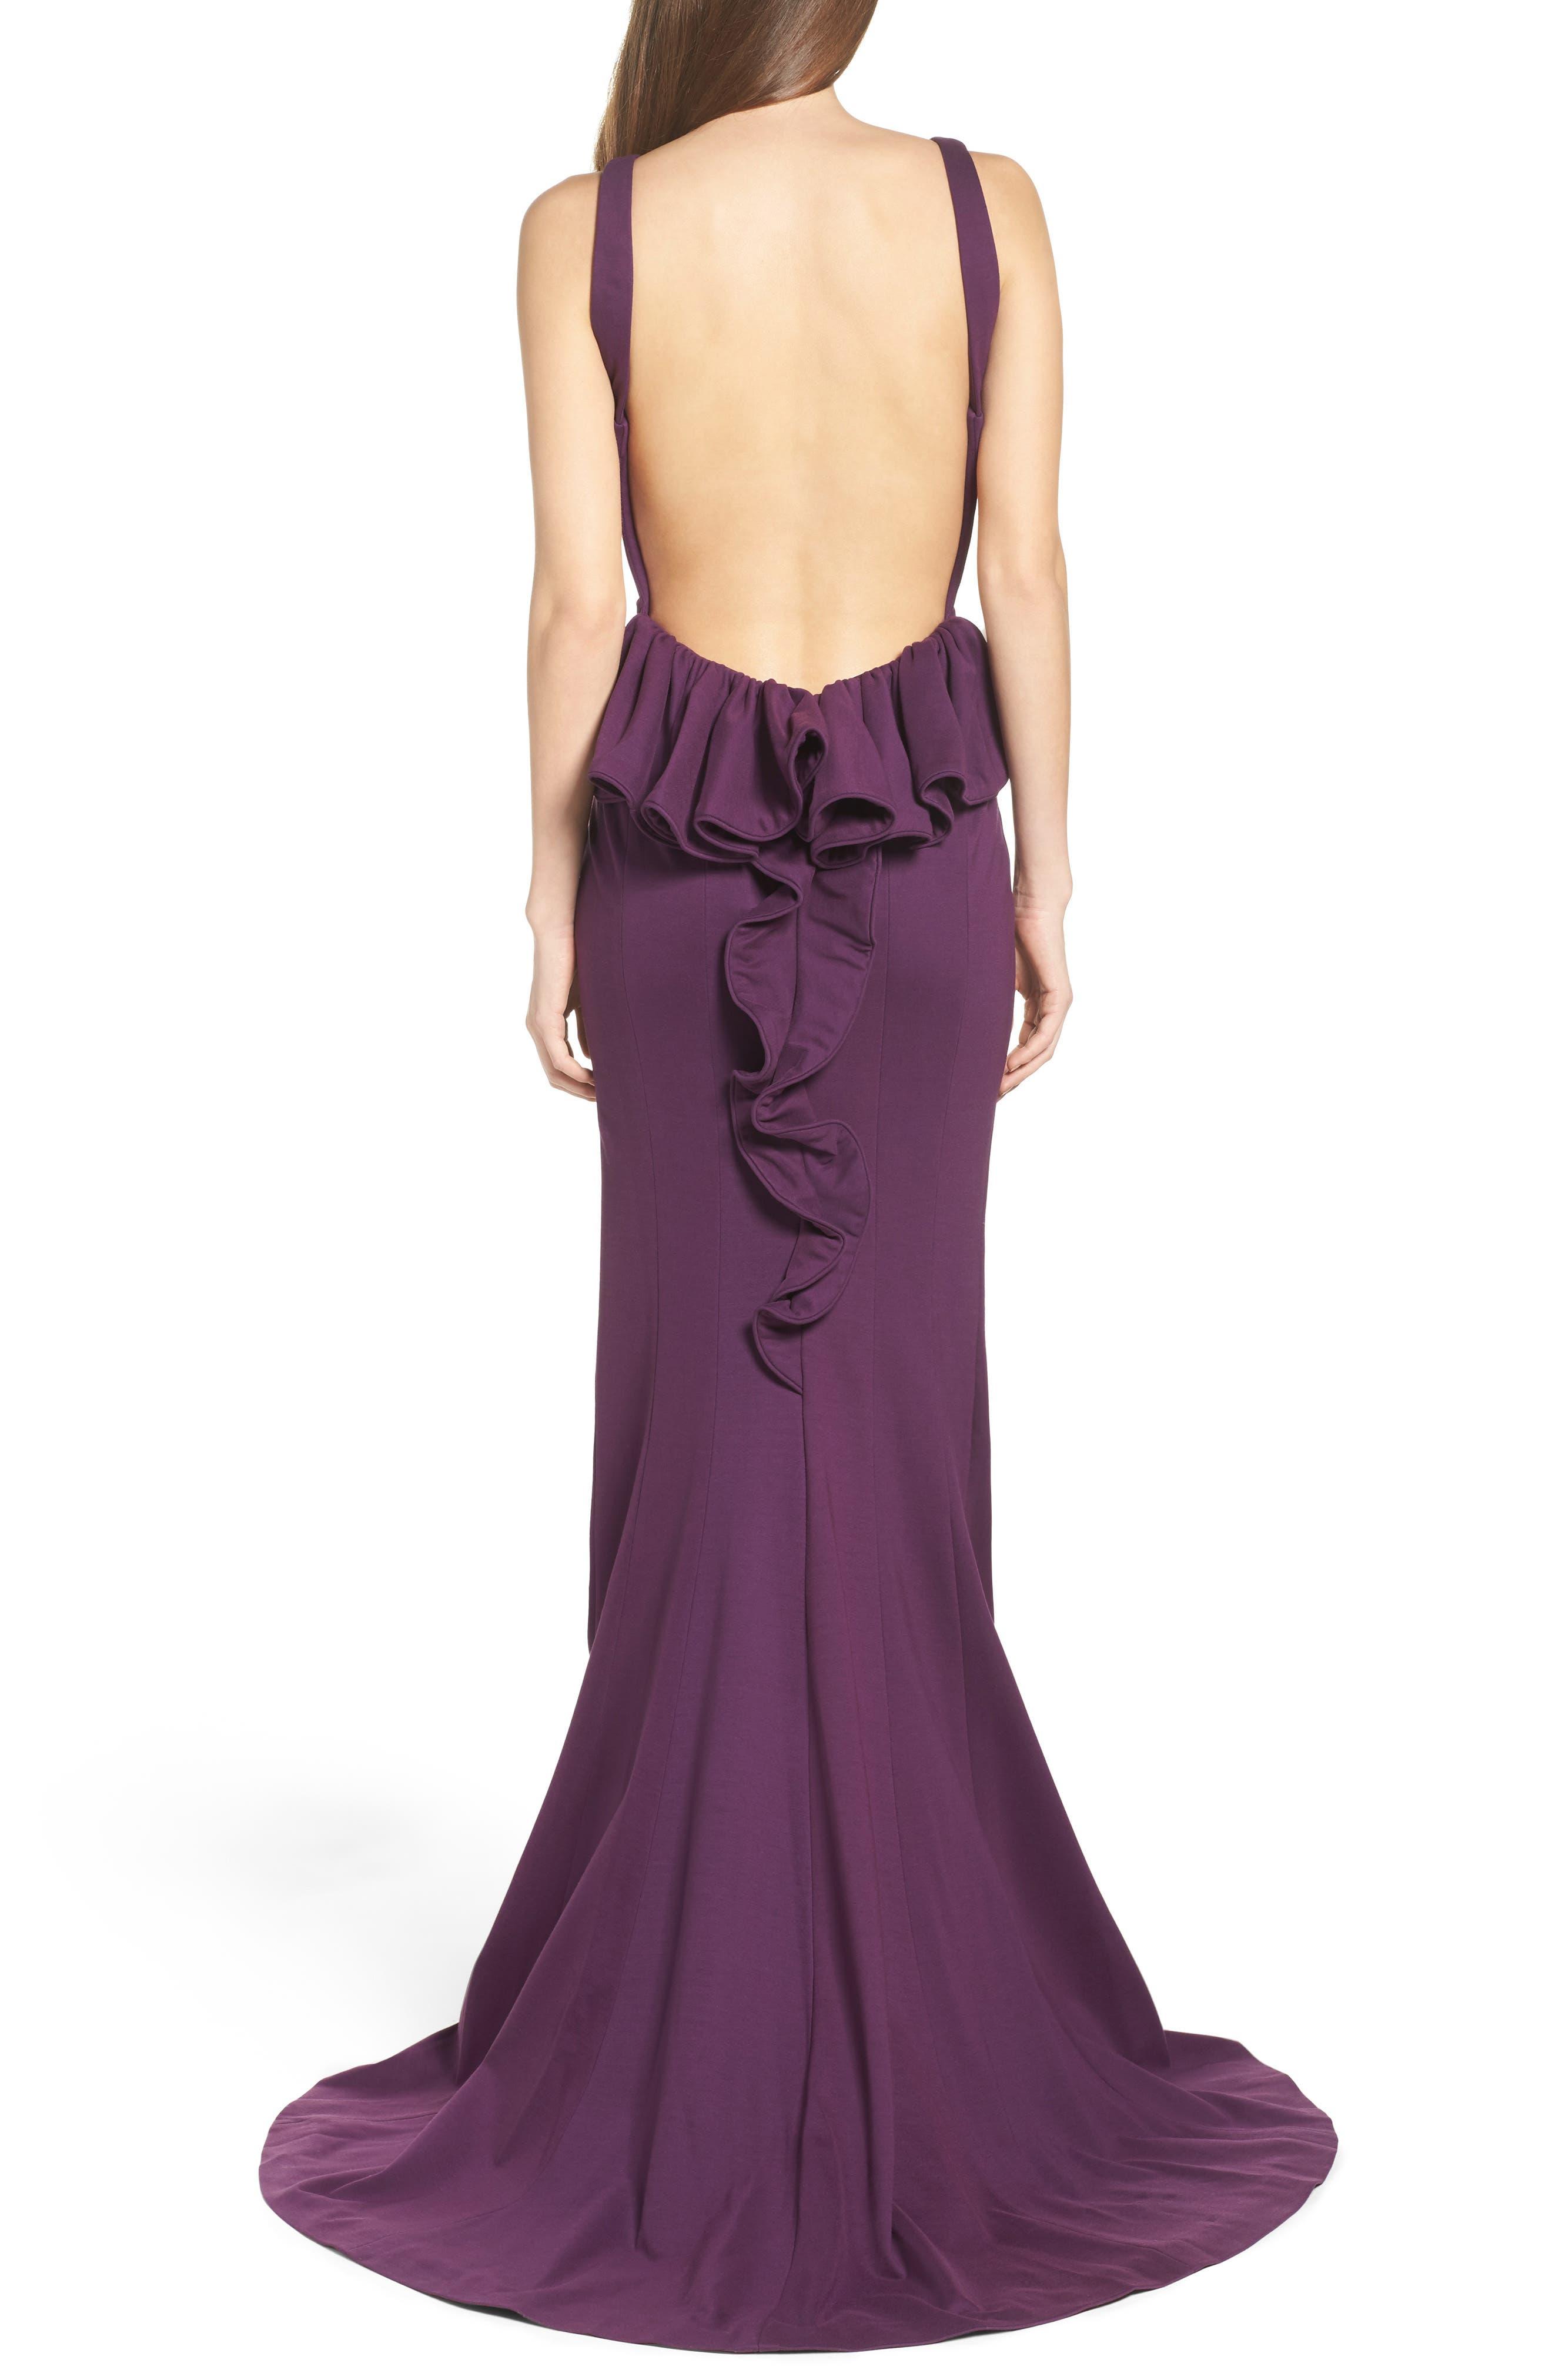 Mermaid Gown,                             Alternate thumbnail 2, color,                             602